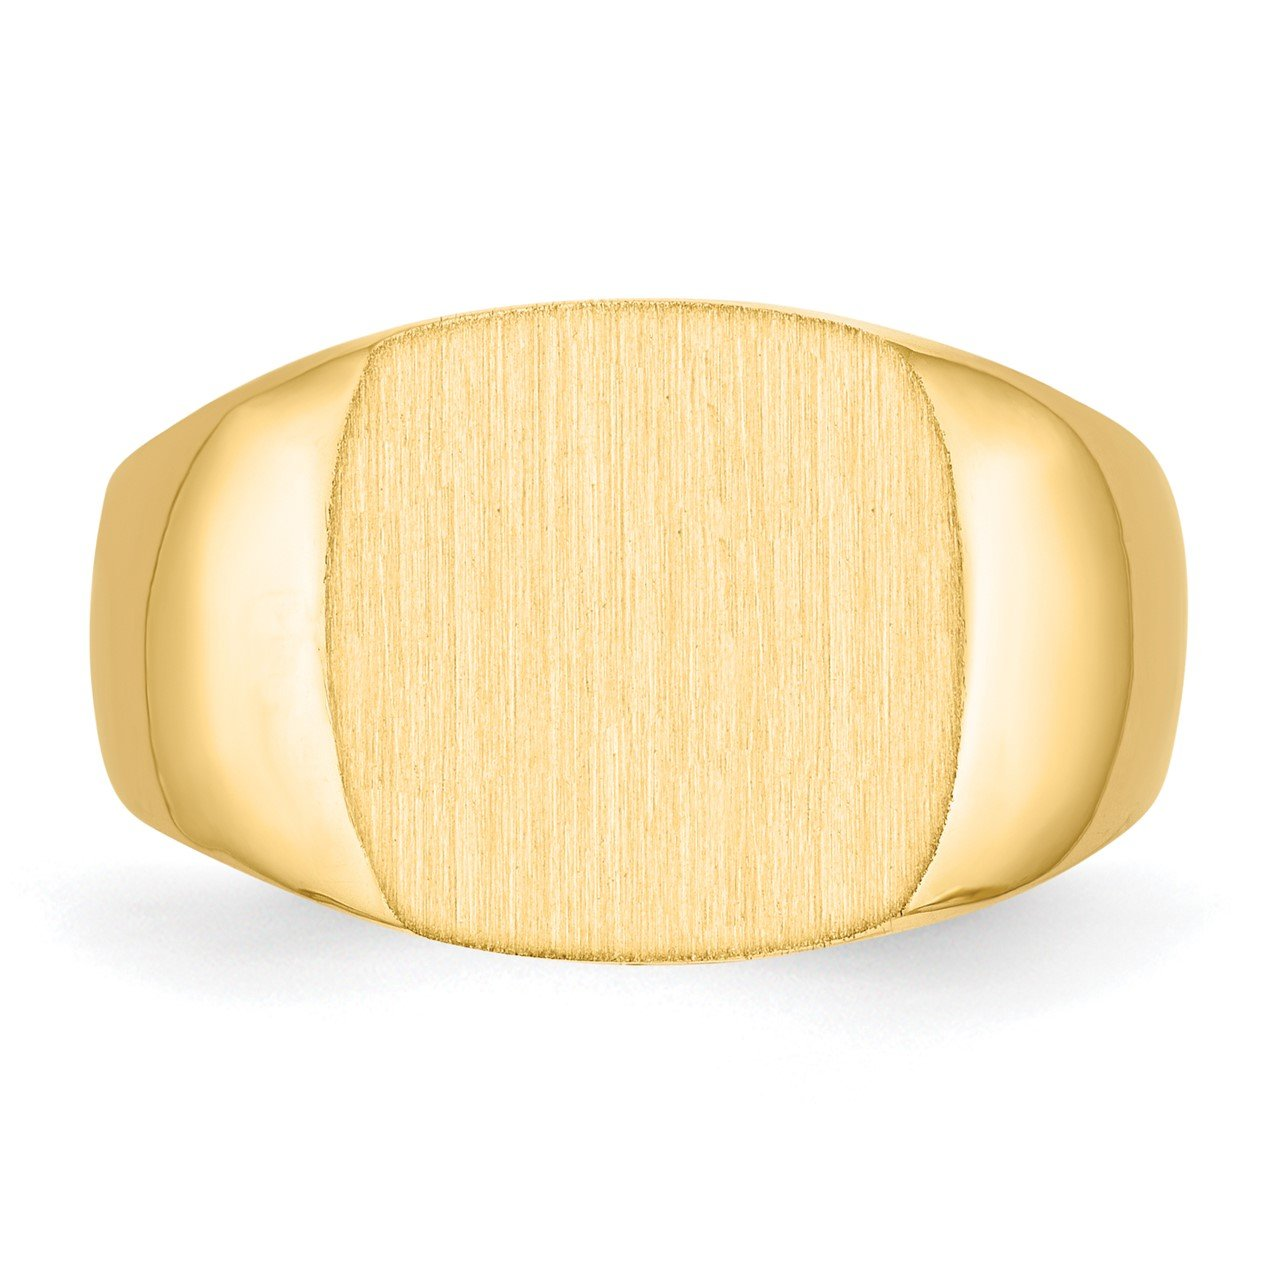 14k 12.0x13.0mm Closed Back Men's Signet Ring-3